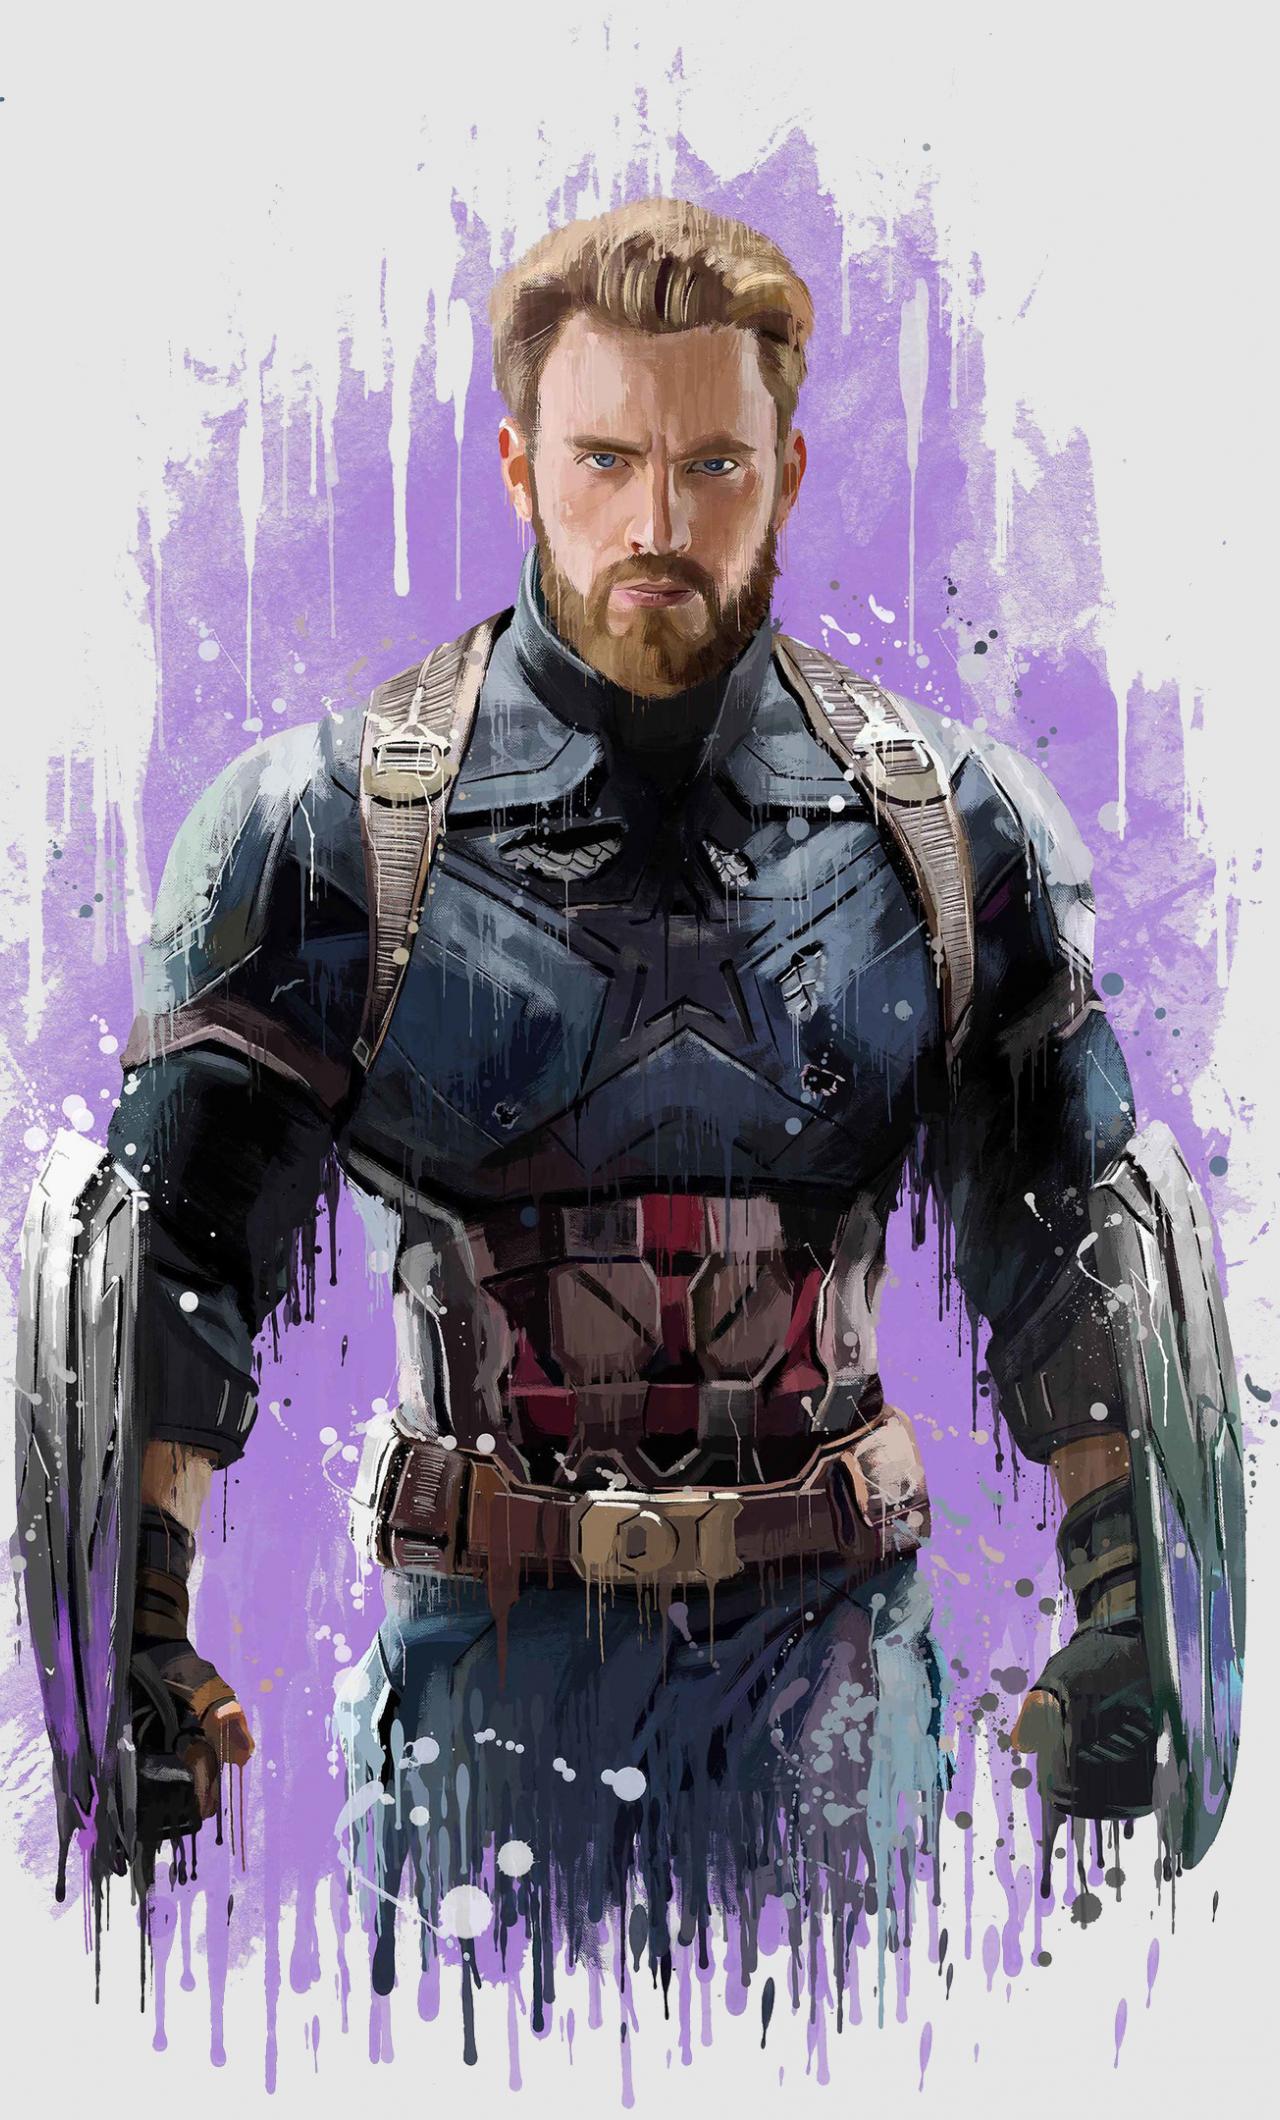 Download 1280x2120 Wallpaper Captain America Avengers Infinity War